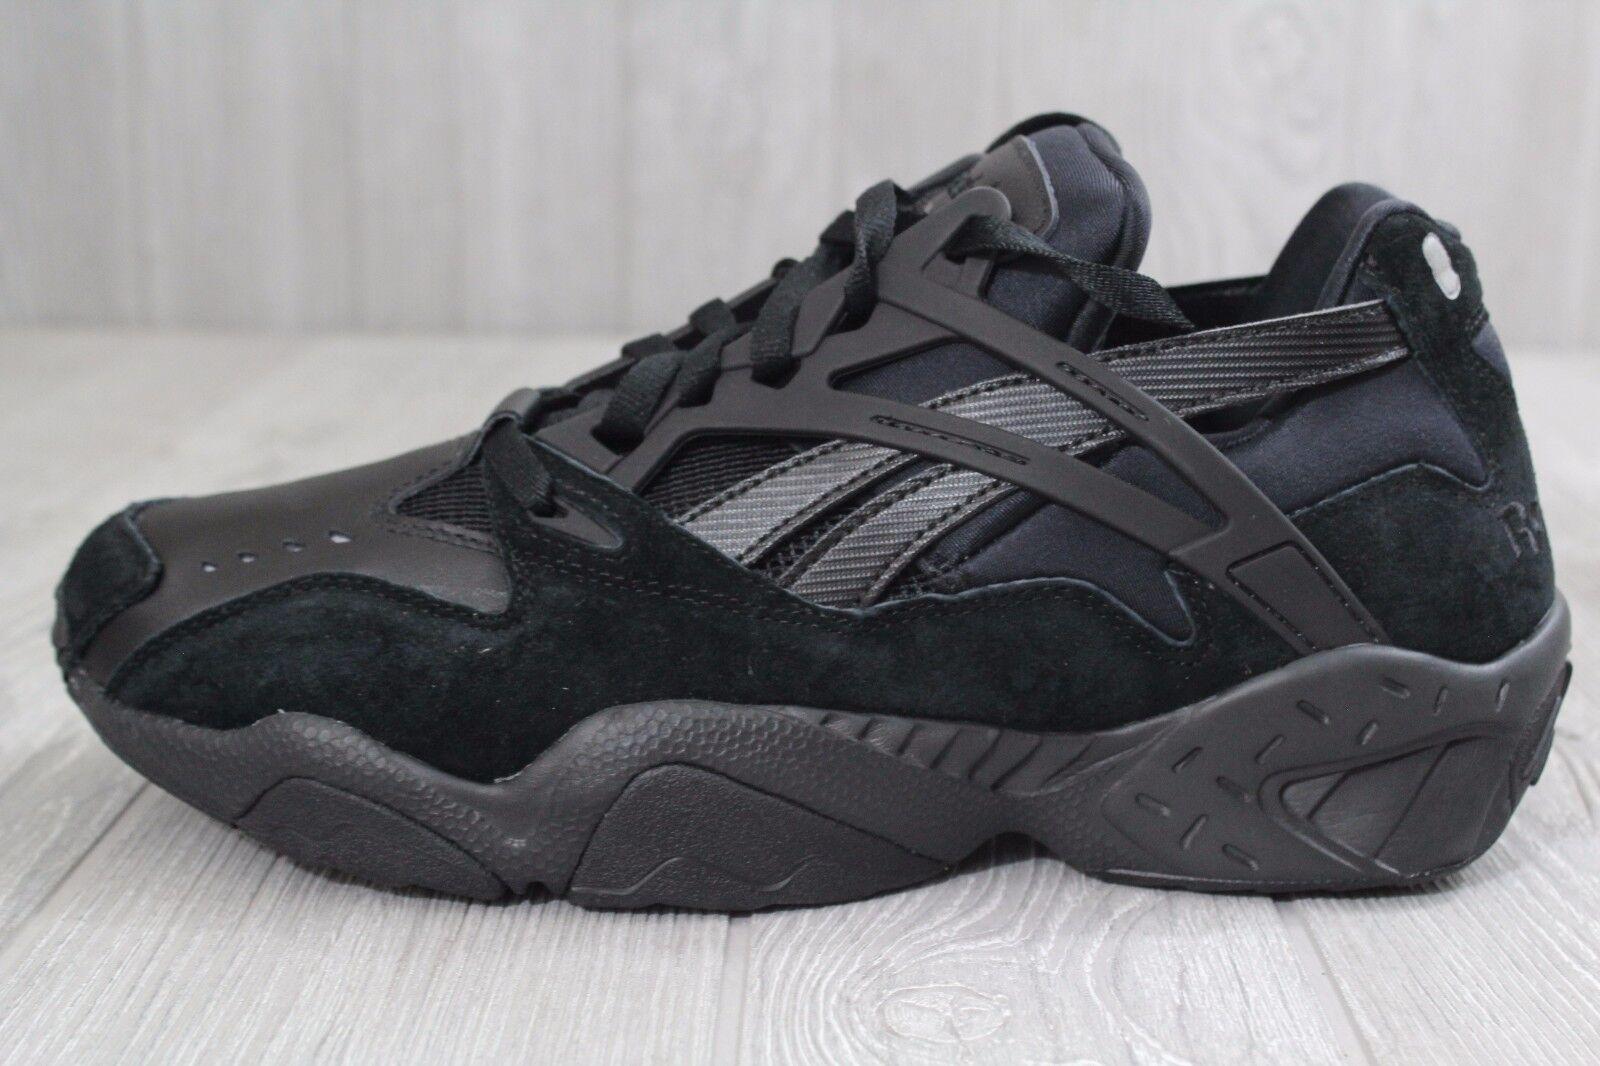 20 New Reebok Men's Sneakers